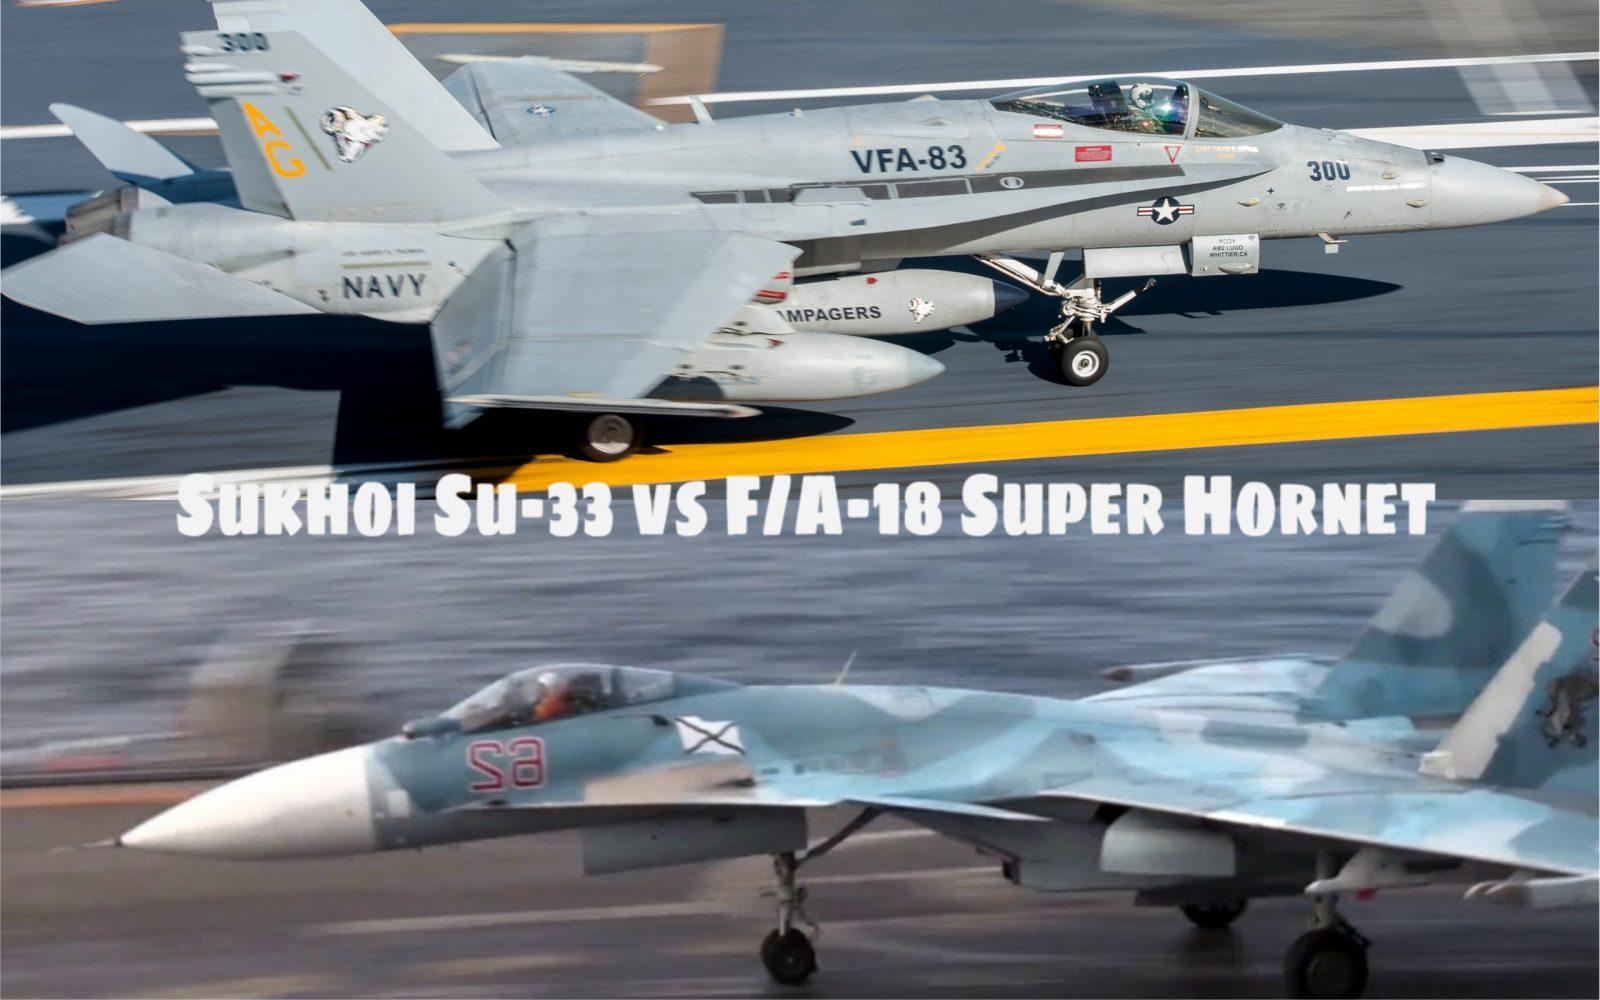 FA-18 Super Hornet VS Sukhoi Su-33